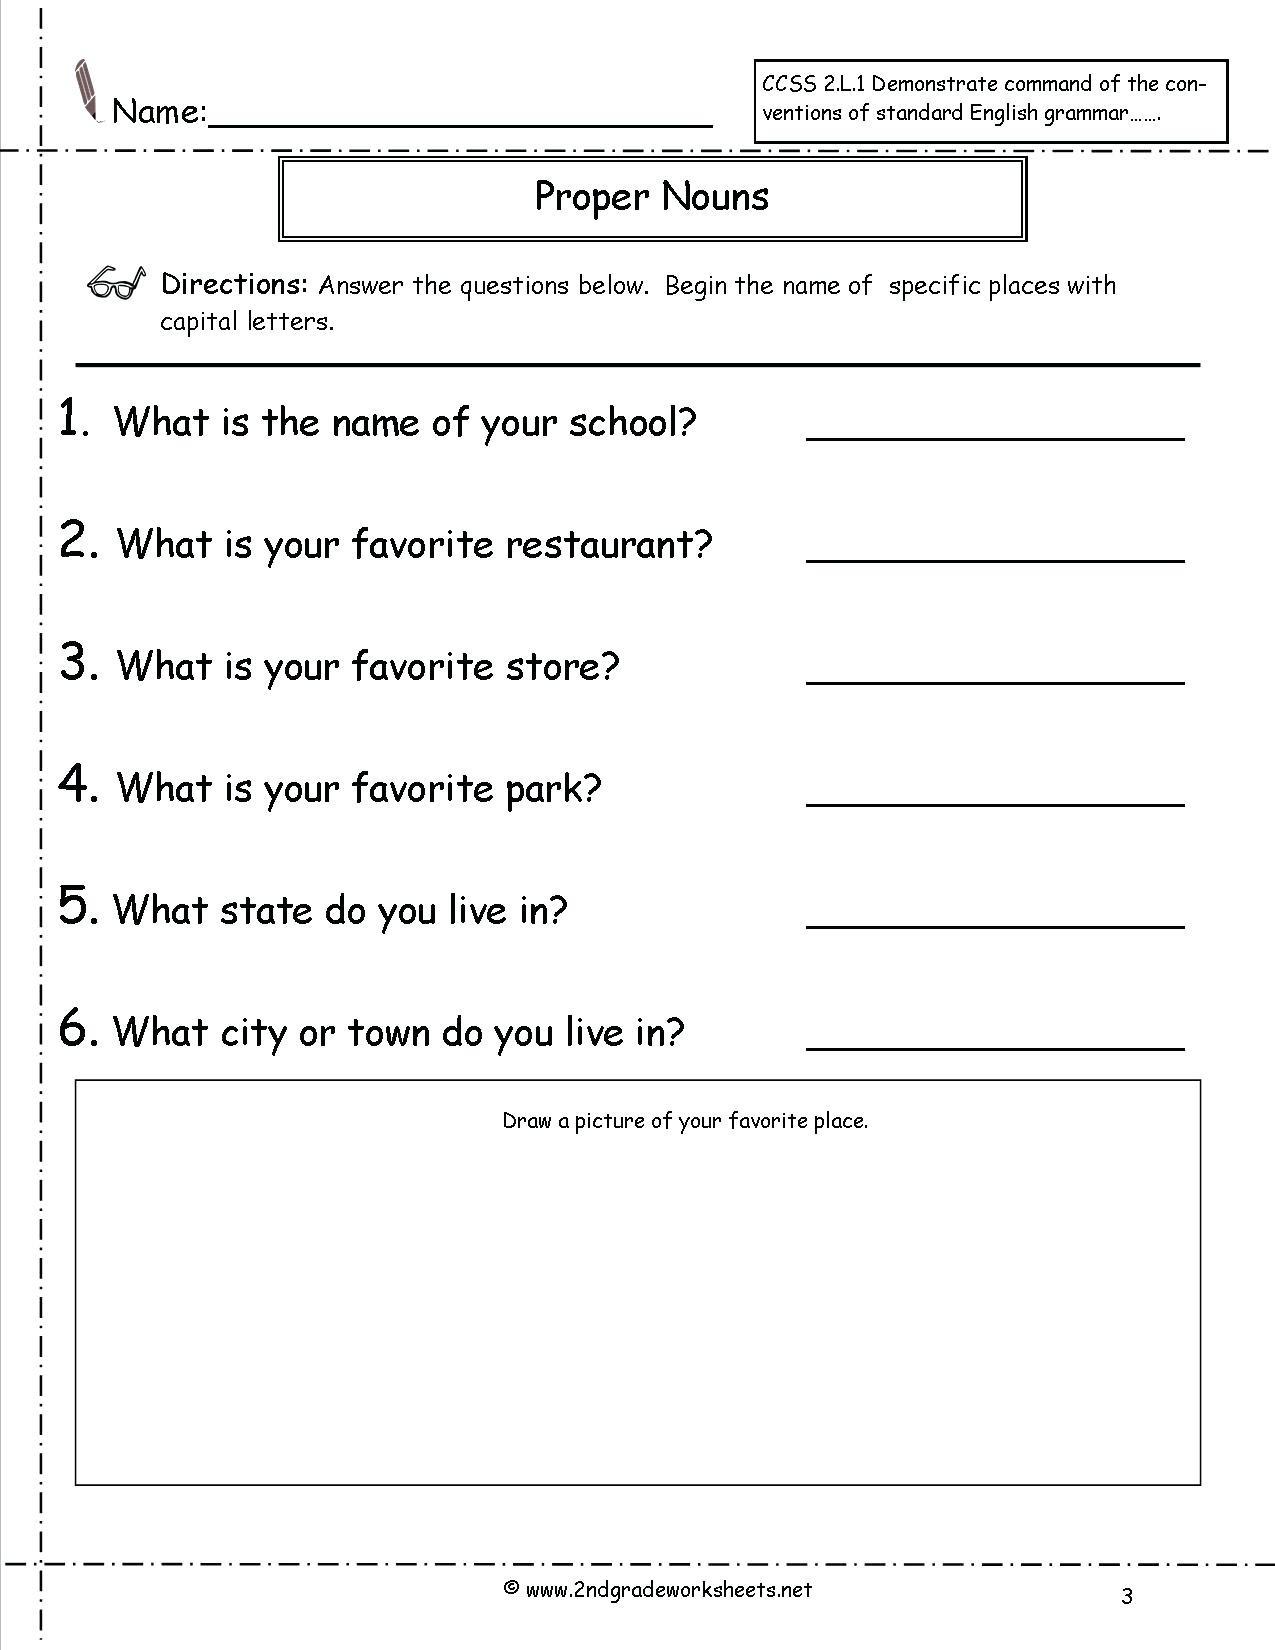 2nd Grade Proper Nouns Worksheet Proper Nouns Worksheet sort the Mon and Proper Nouns